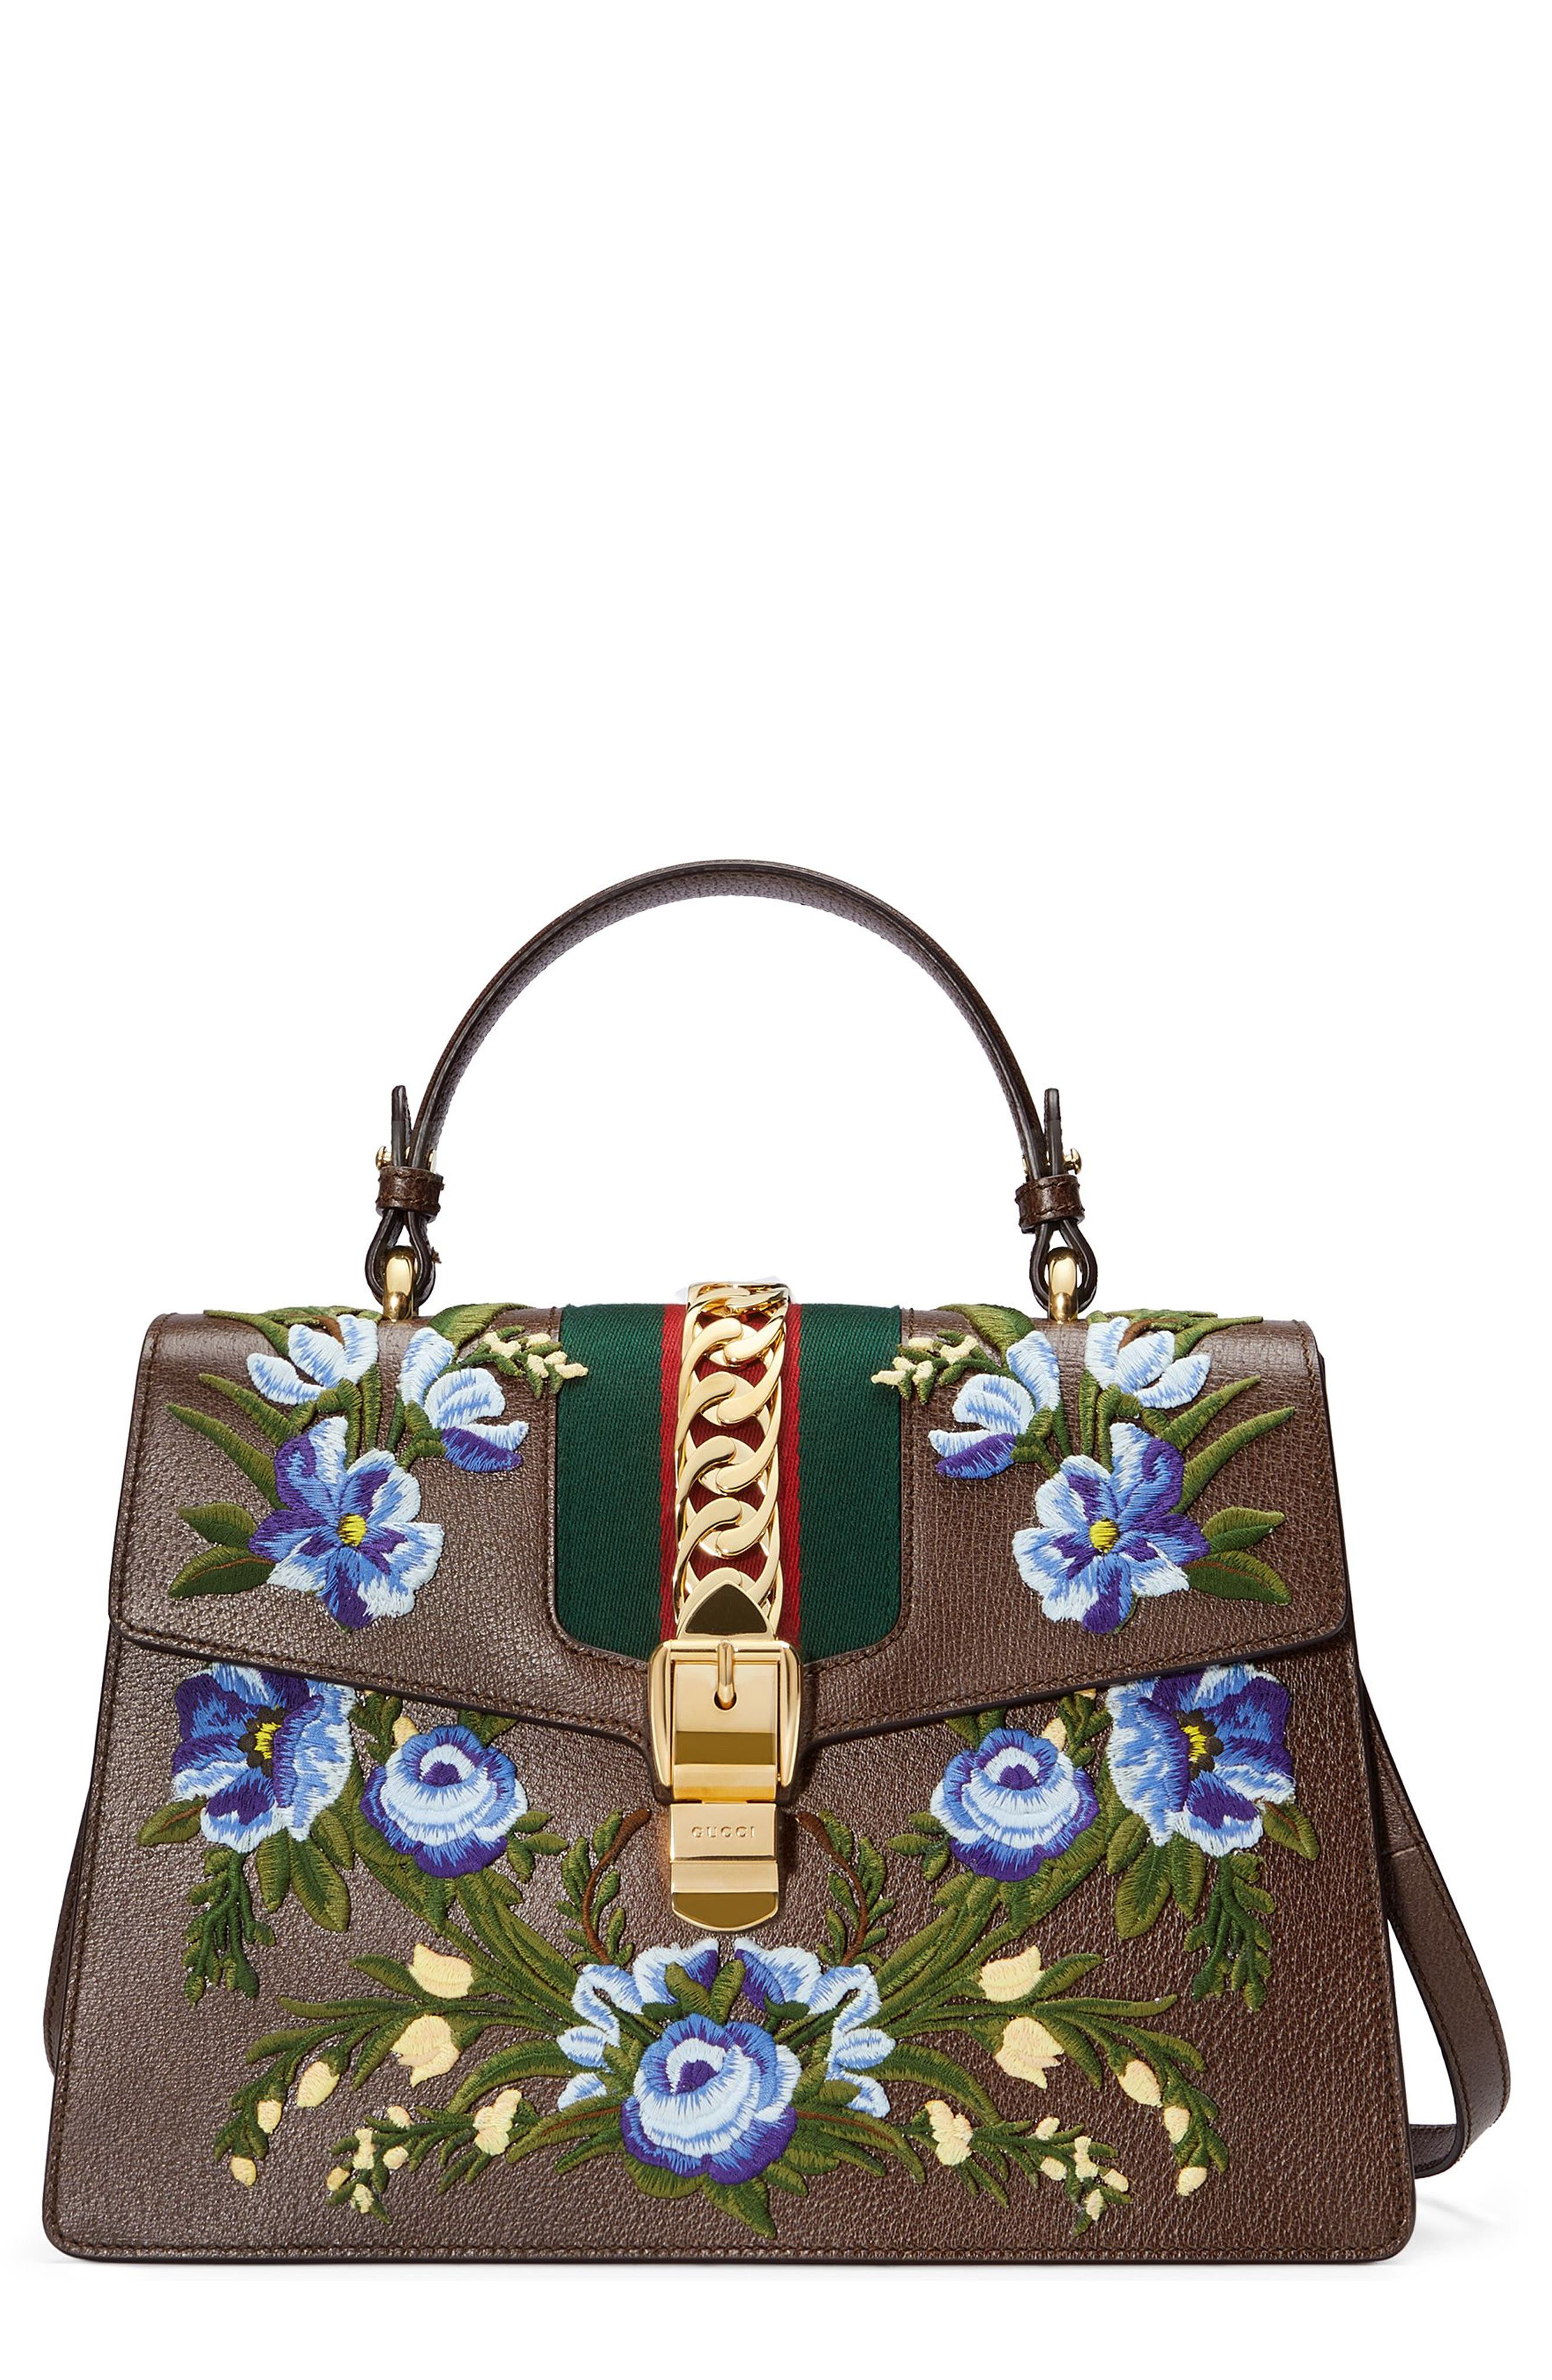 Gucci Medium Sylvie Embroidered Top Handle Leather Shoulder Bag